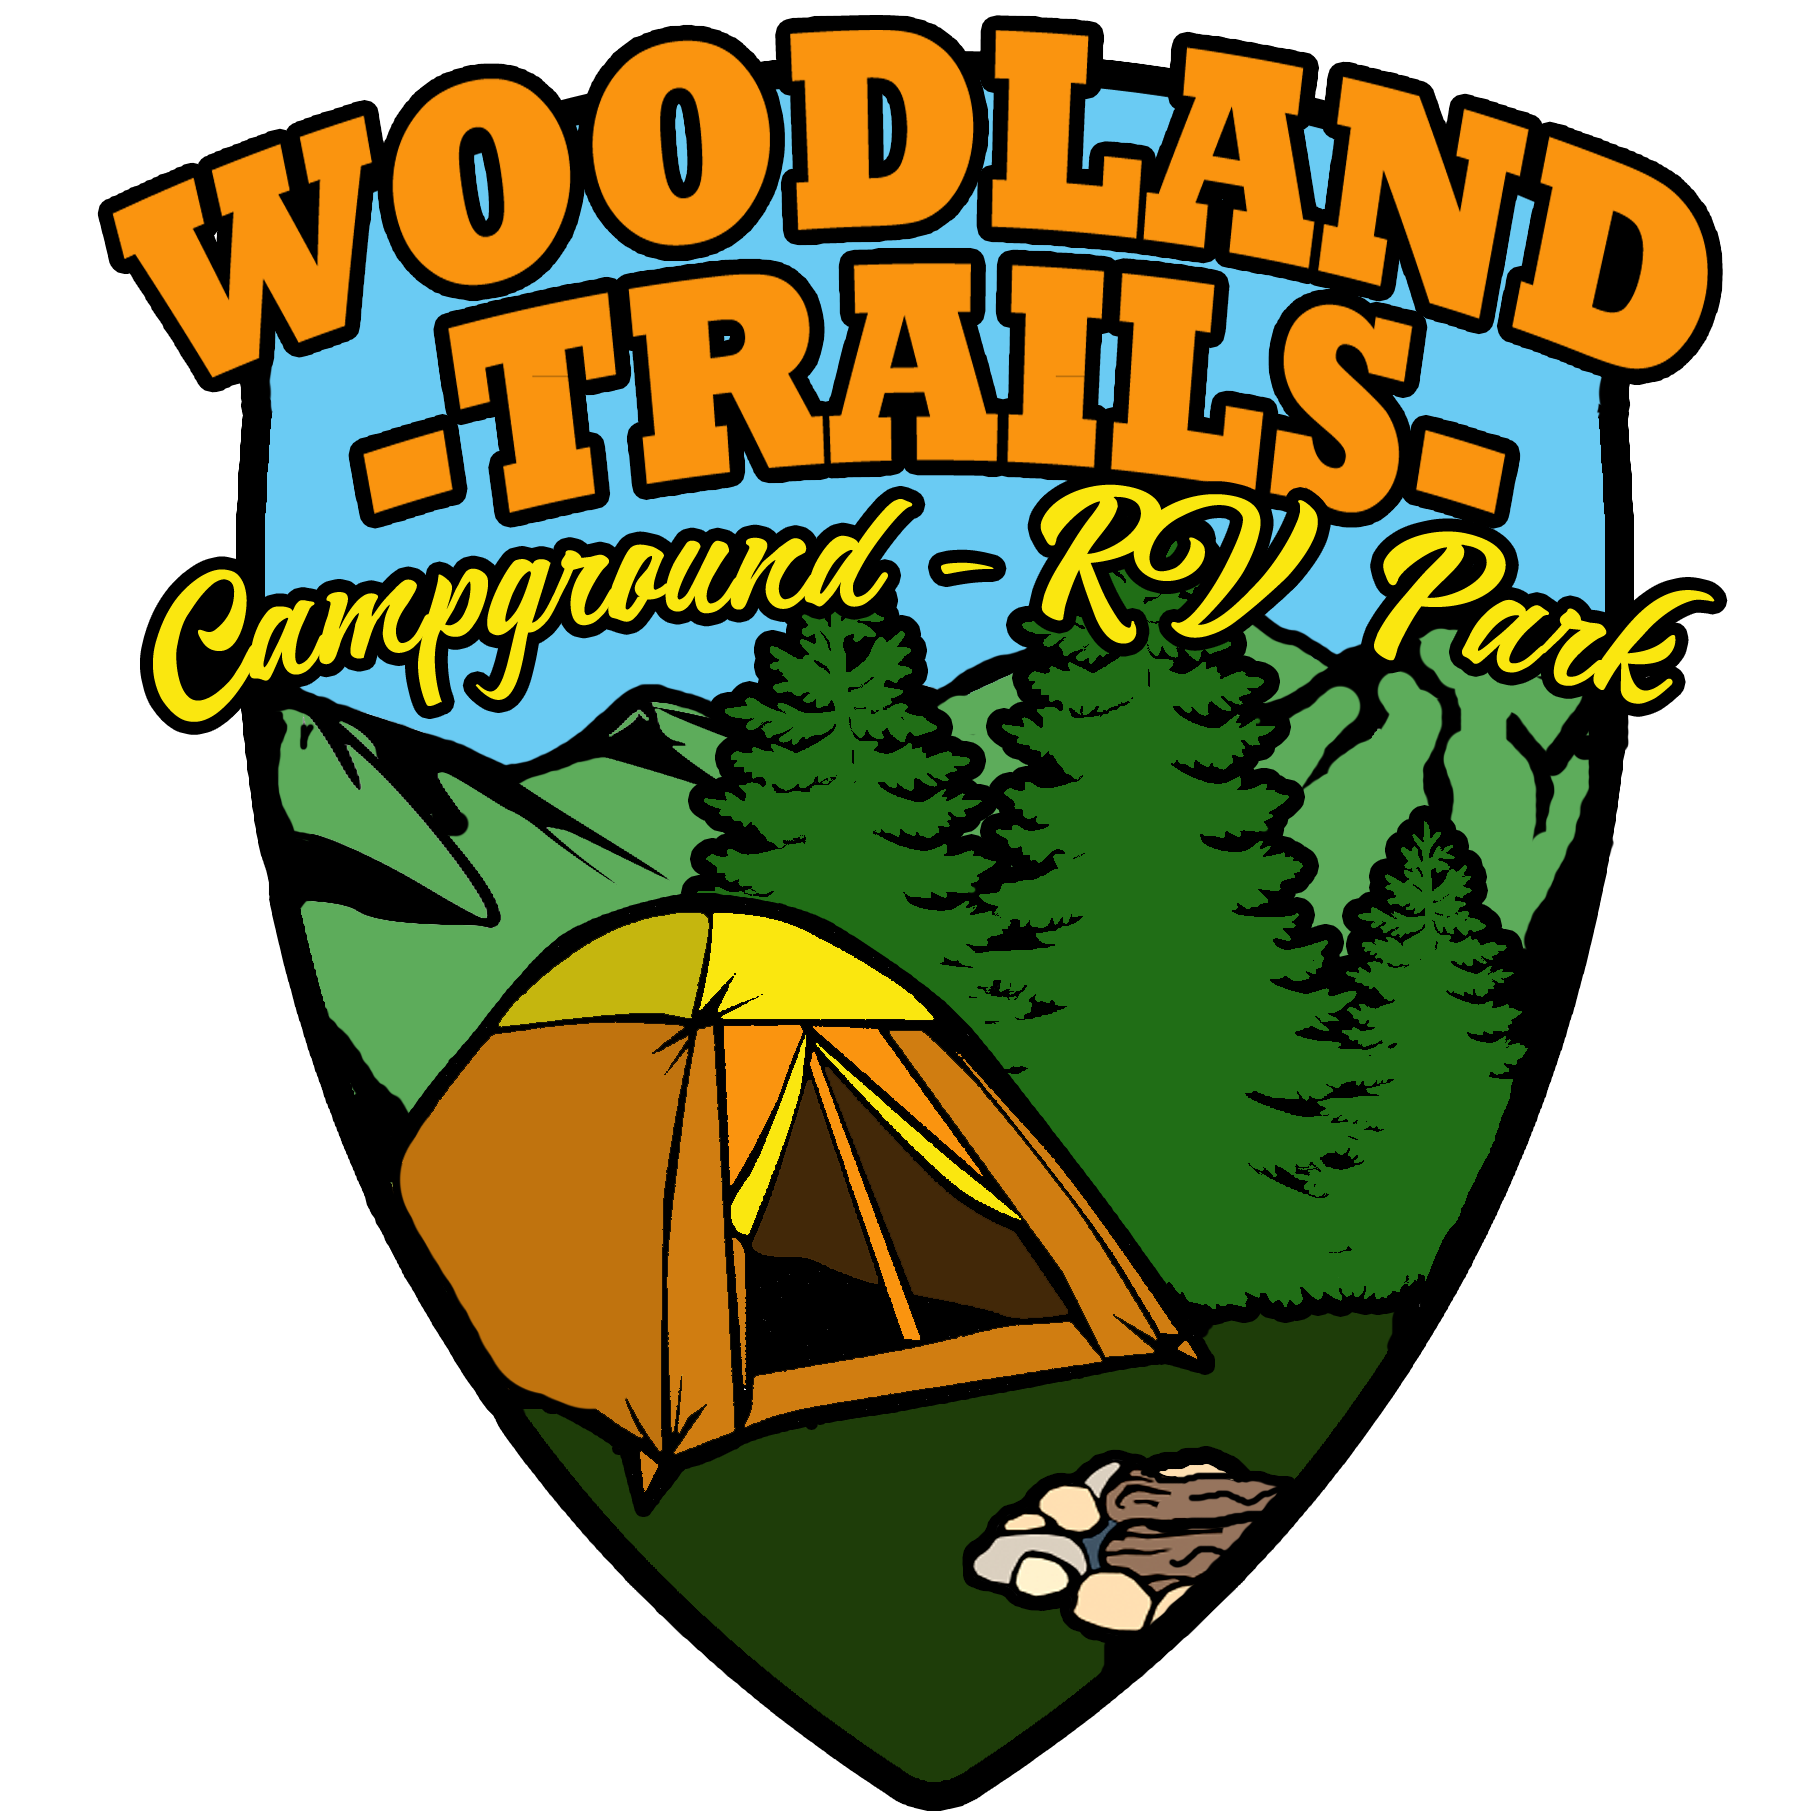 Woodland Trails Camp